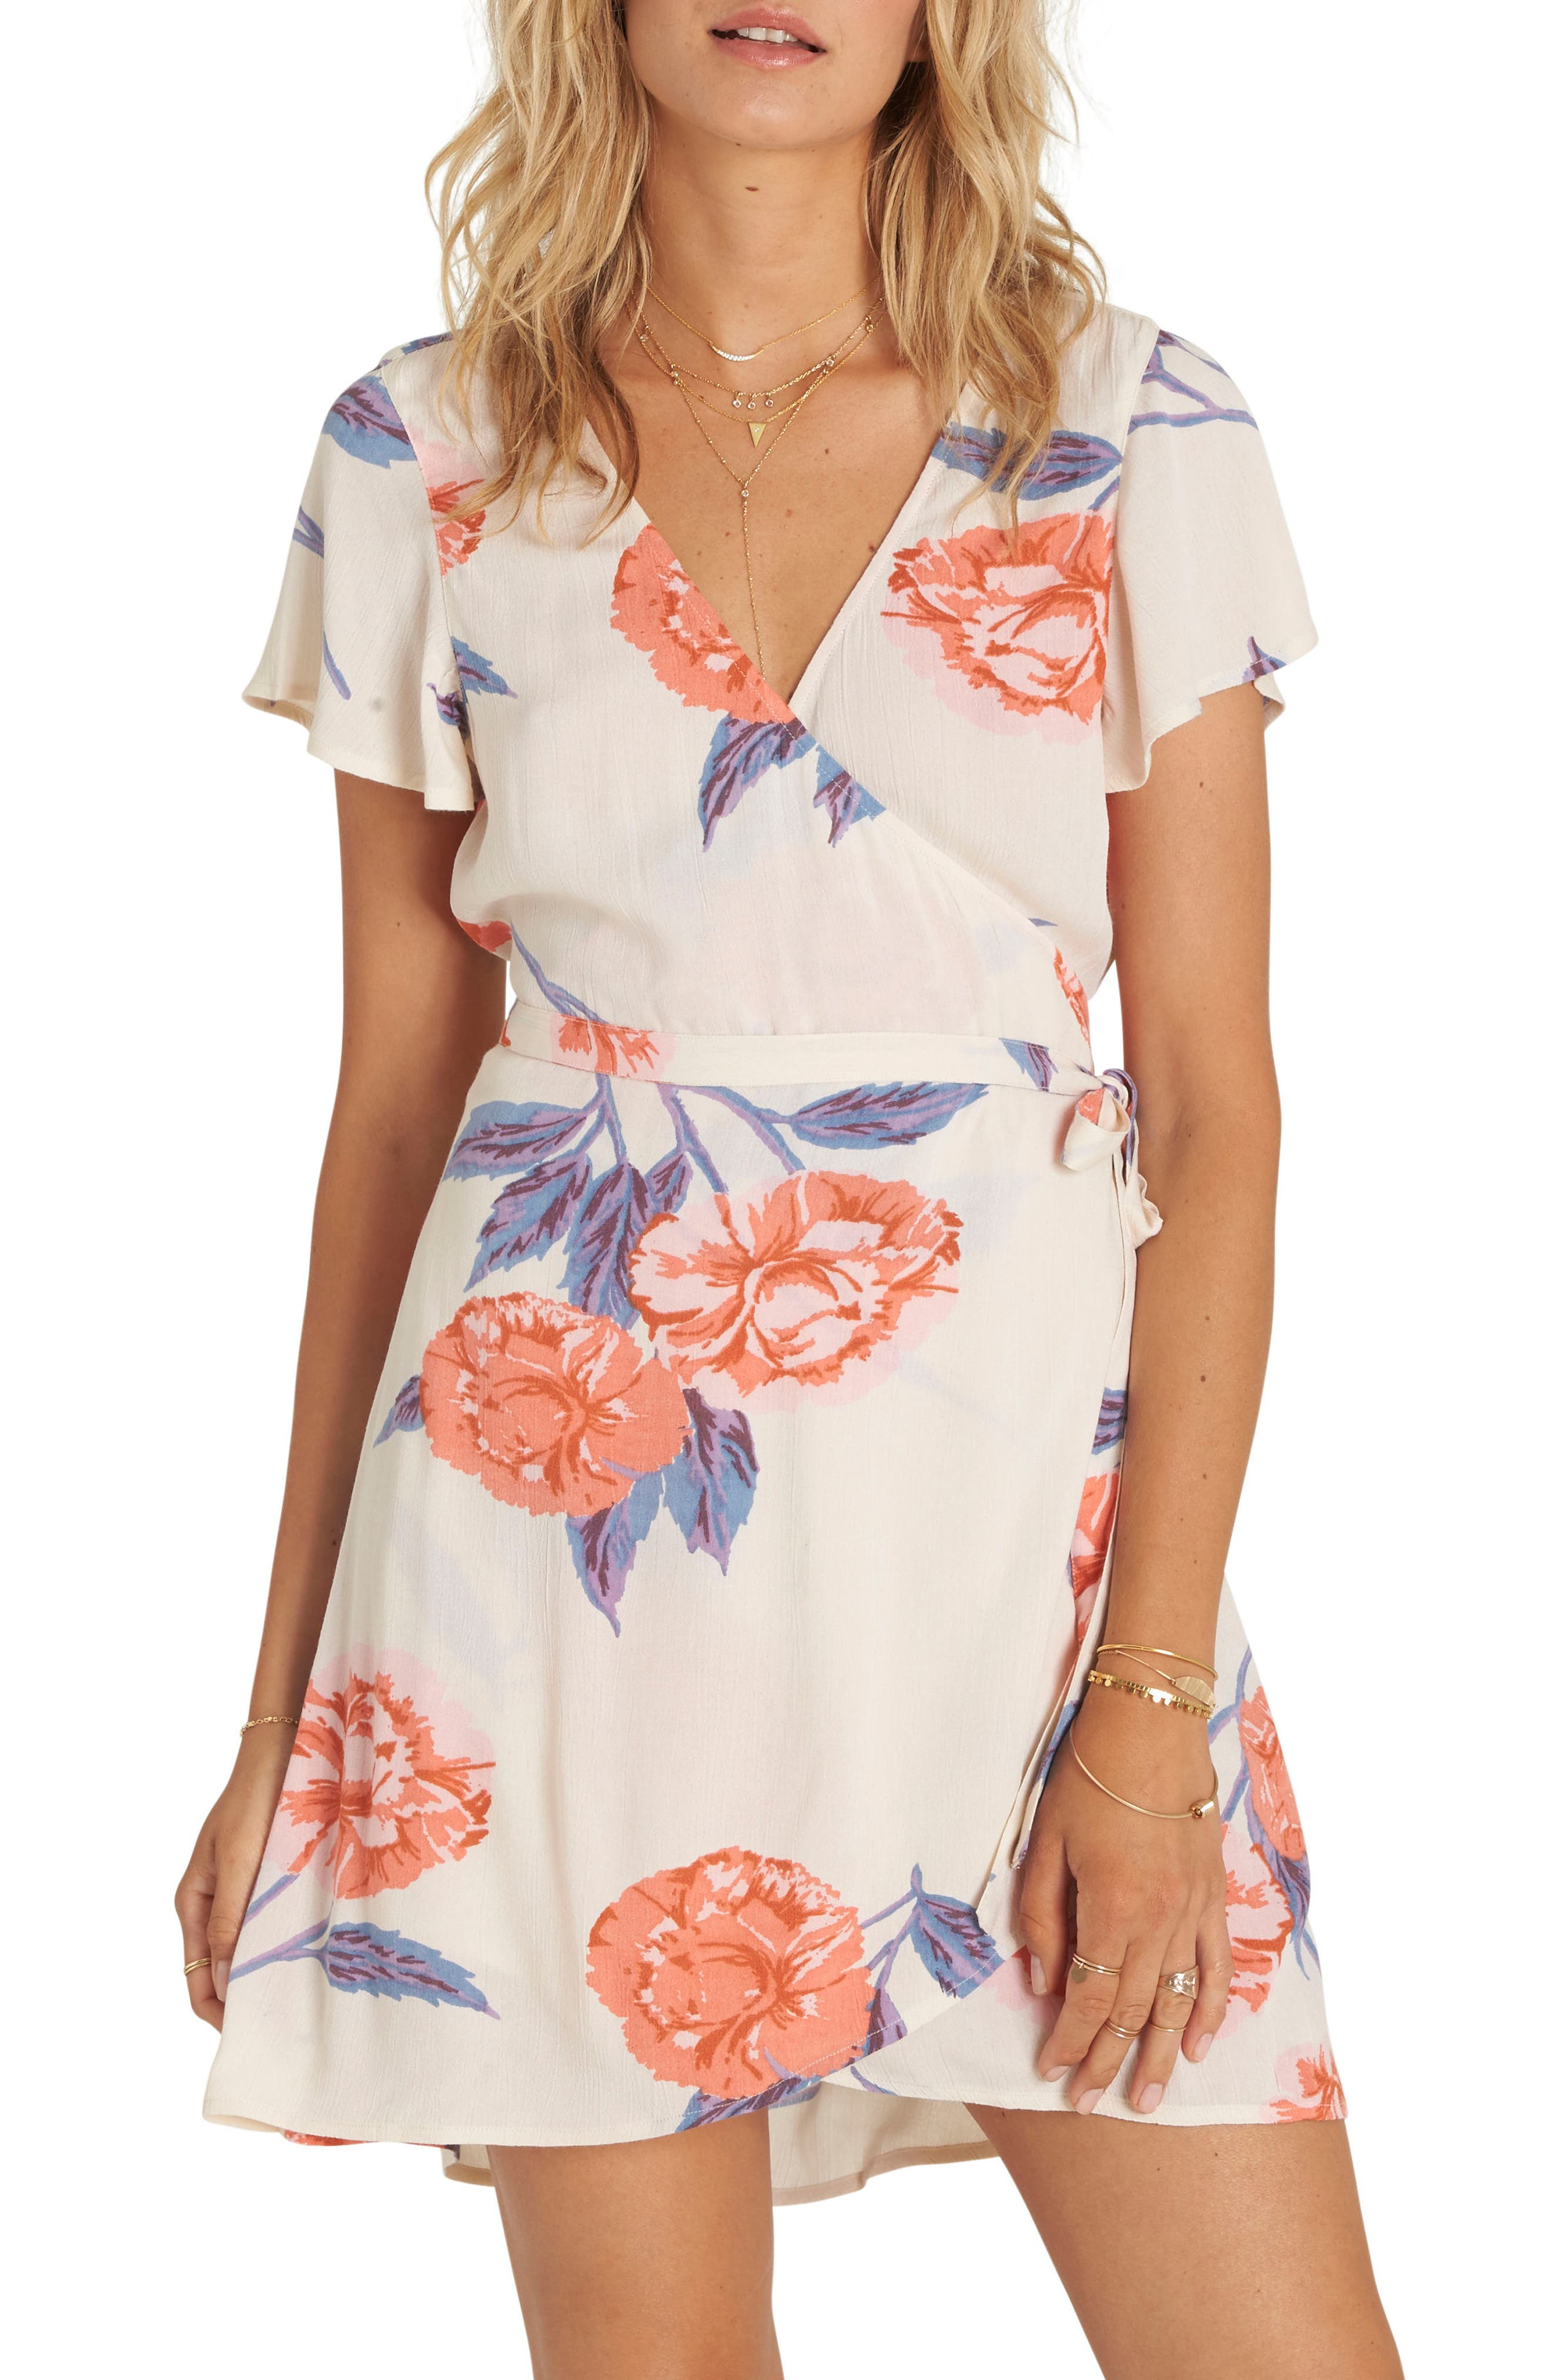 Alternate Image 1 Selected - Billabong Hold Me Tight Floral Print Wrap Dress